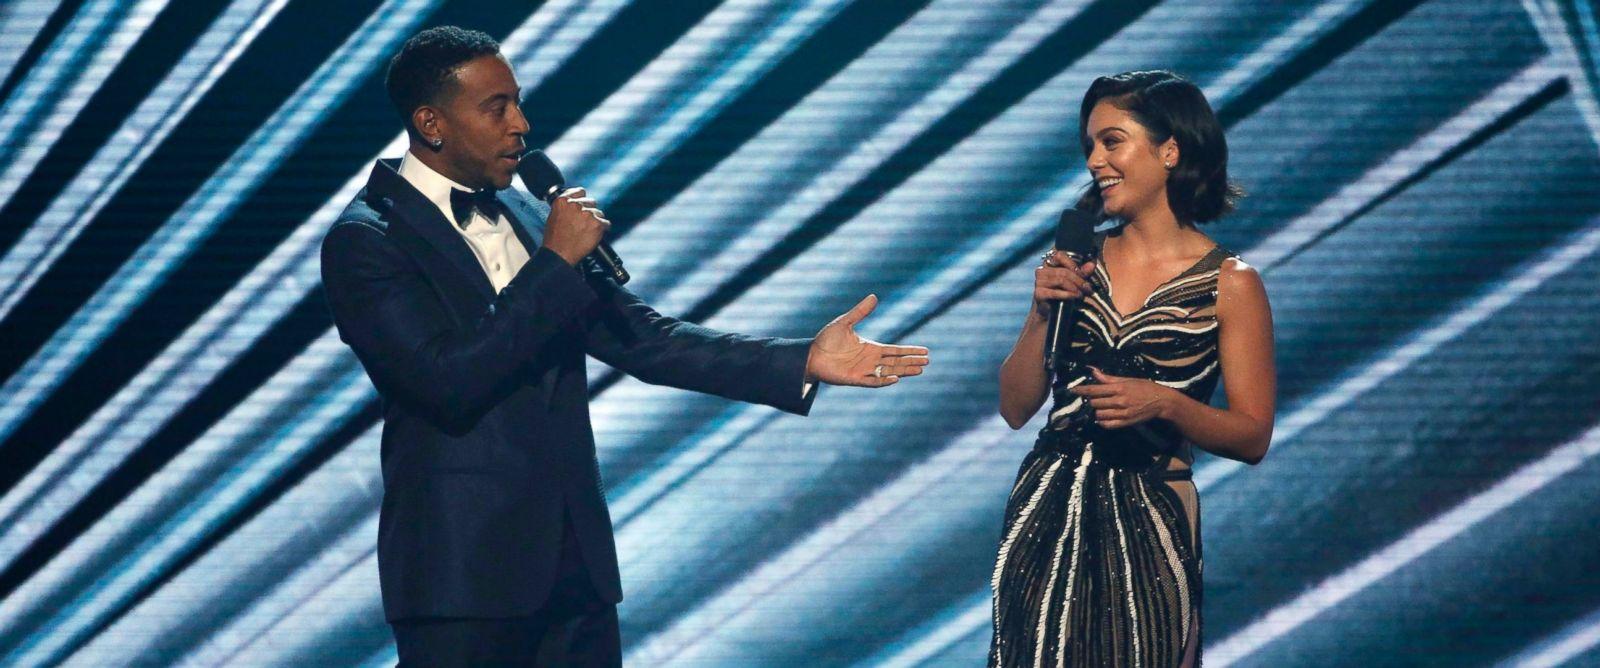 RT-billboard-awards-ludacris-hudgens-win-jef170521_12x5_1600_1495463247817.jpg